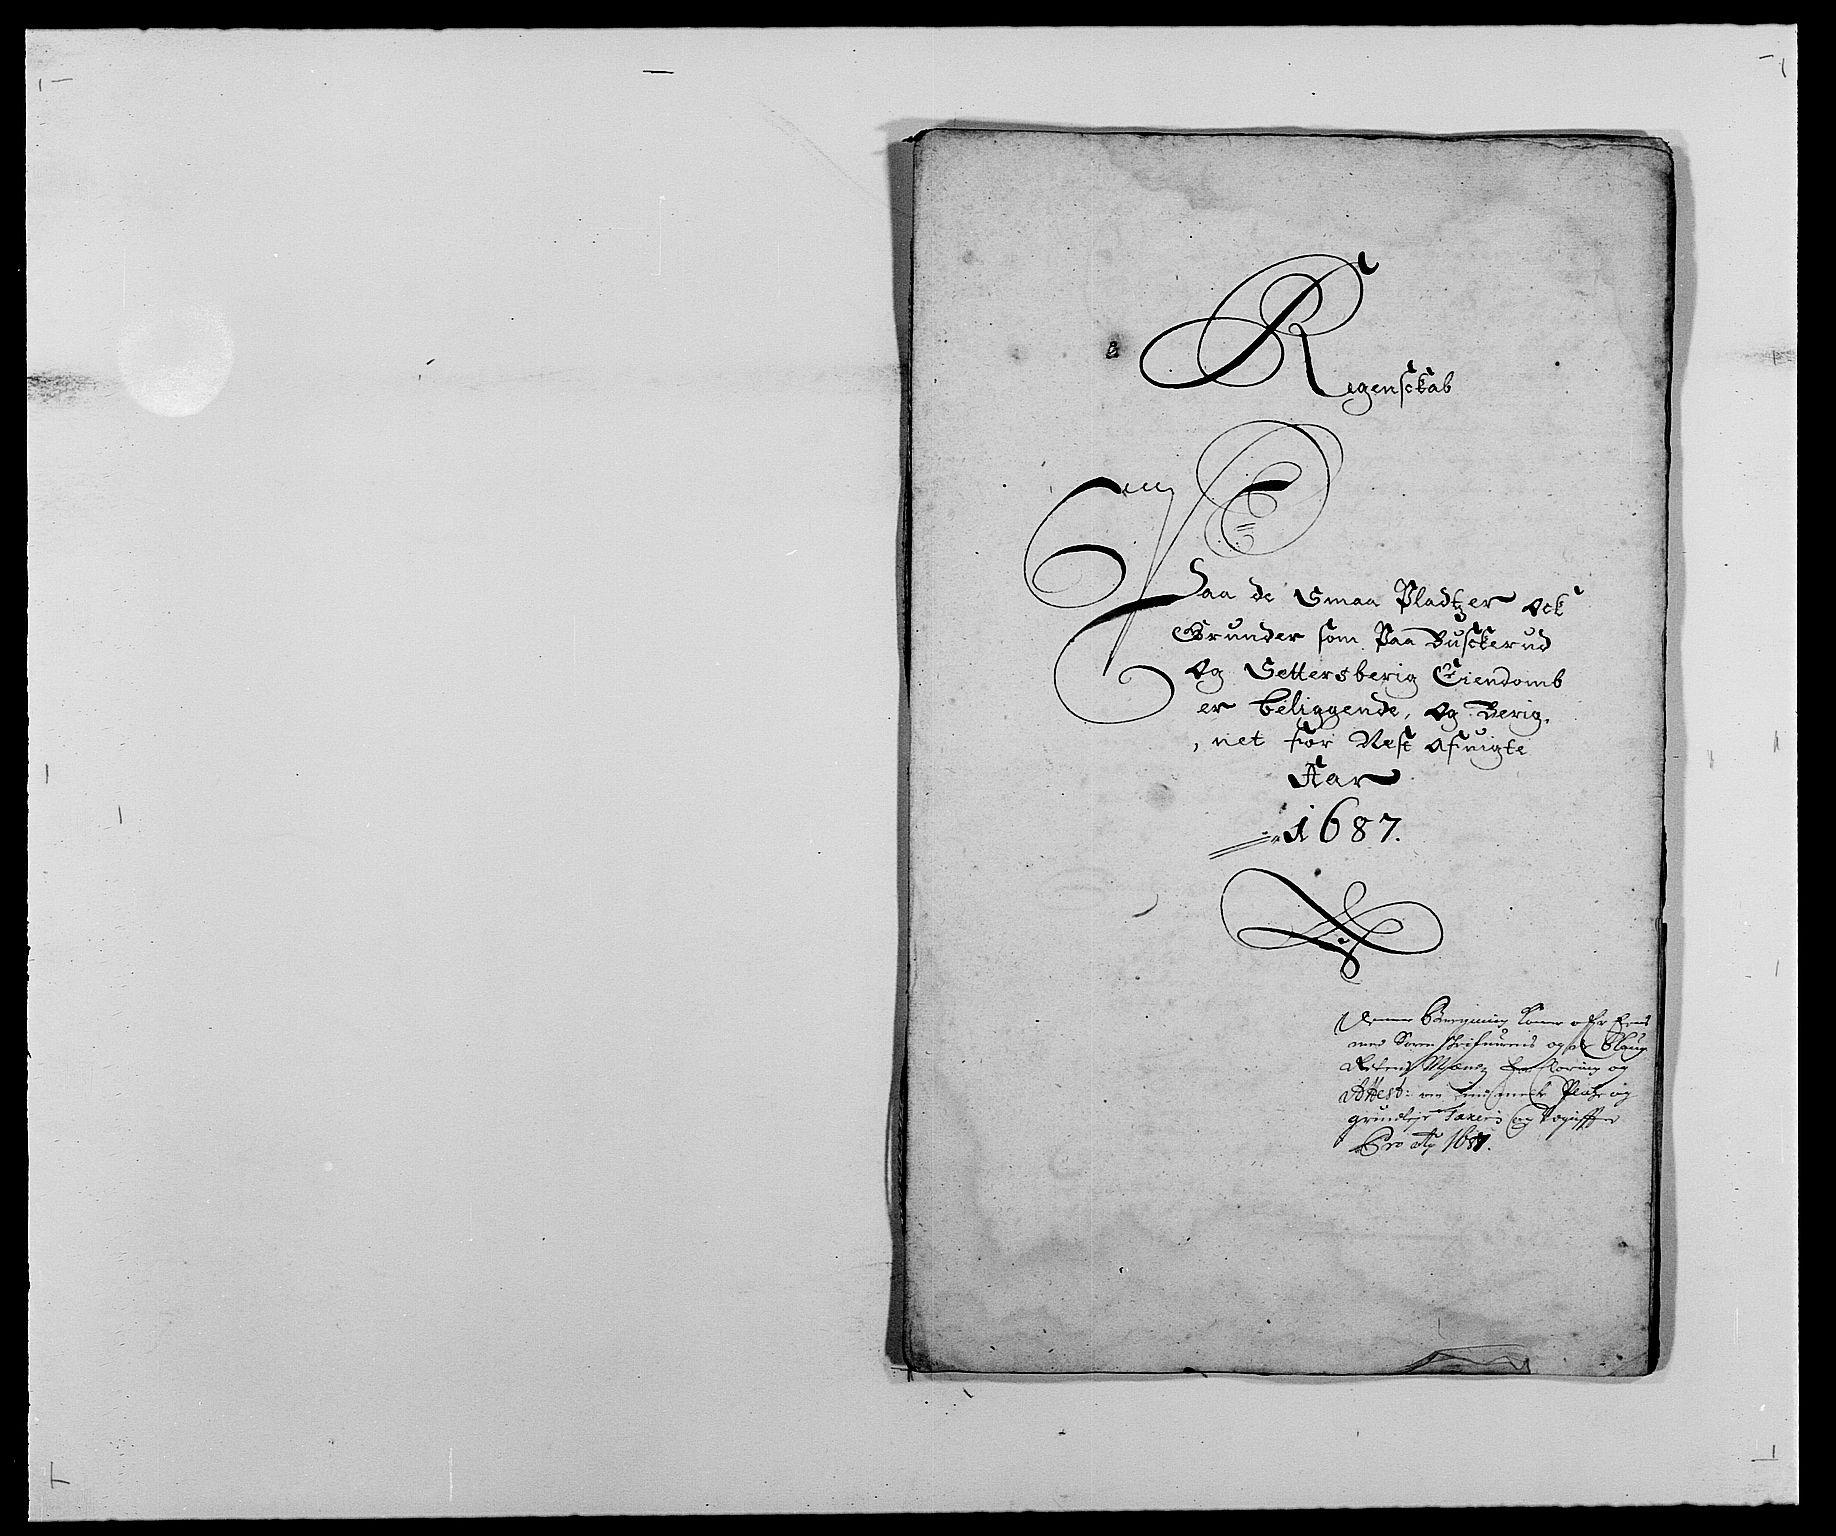 RA, Rentekammeret inntil 1814, Reviderte regnskaper, Fogderegnskap, R25/L1679: Fogderegnskap Buskerud, 1687-1688, s. 518